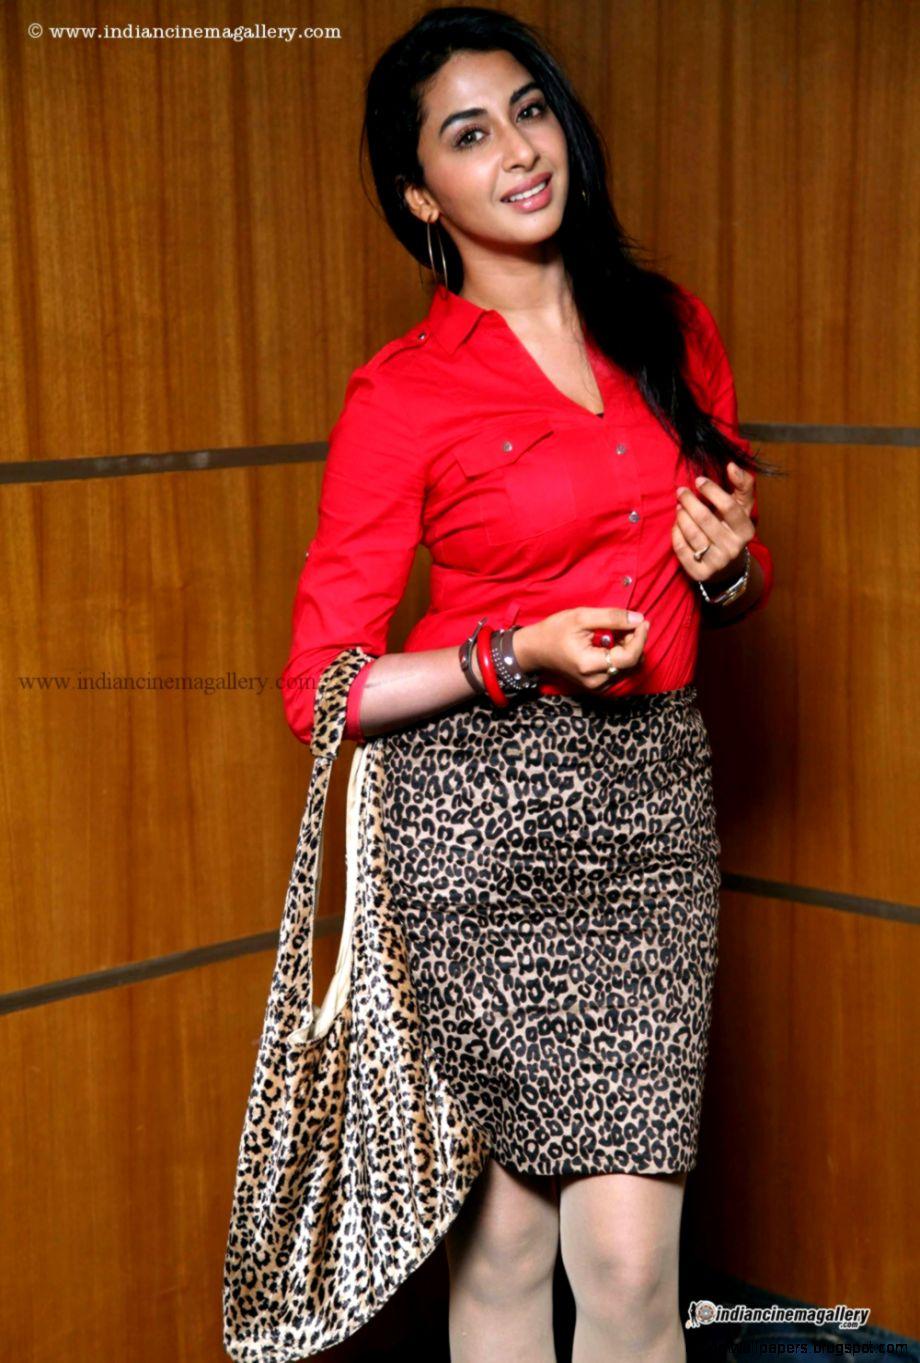 athri Iyer Actress Photos Stills Gallery